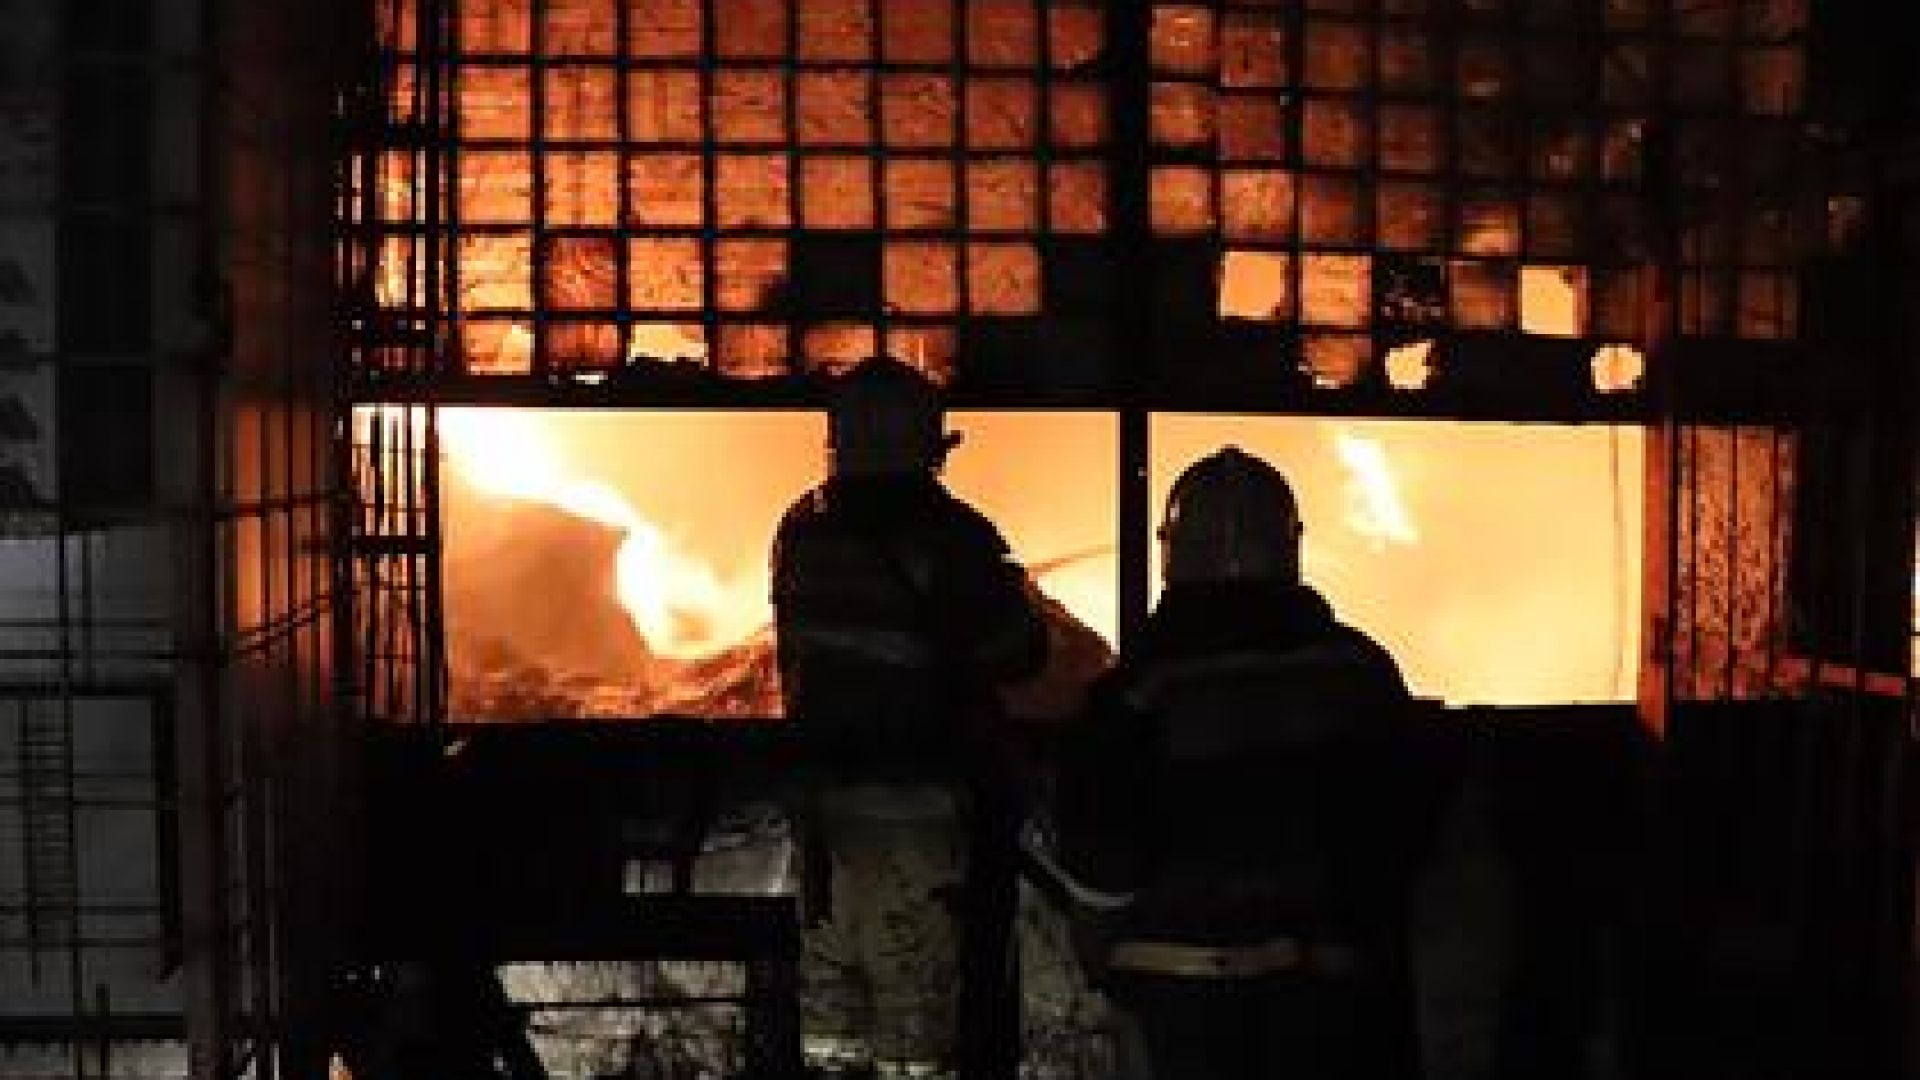 11 жертви при огнен ад в старчески дом в Русия (видео)